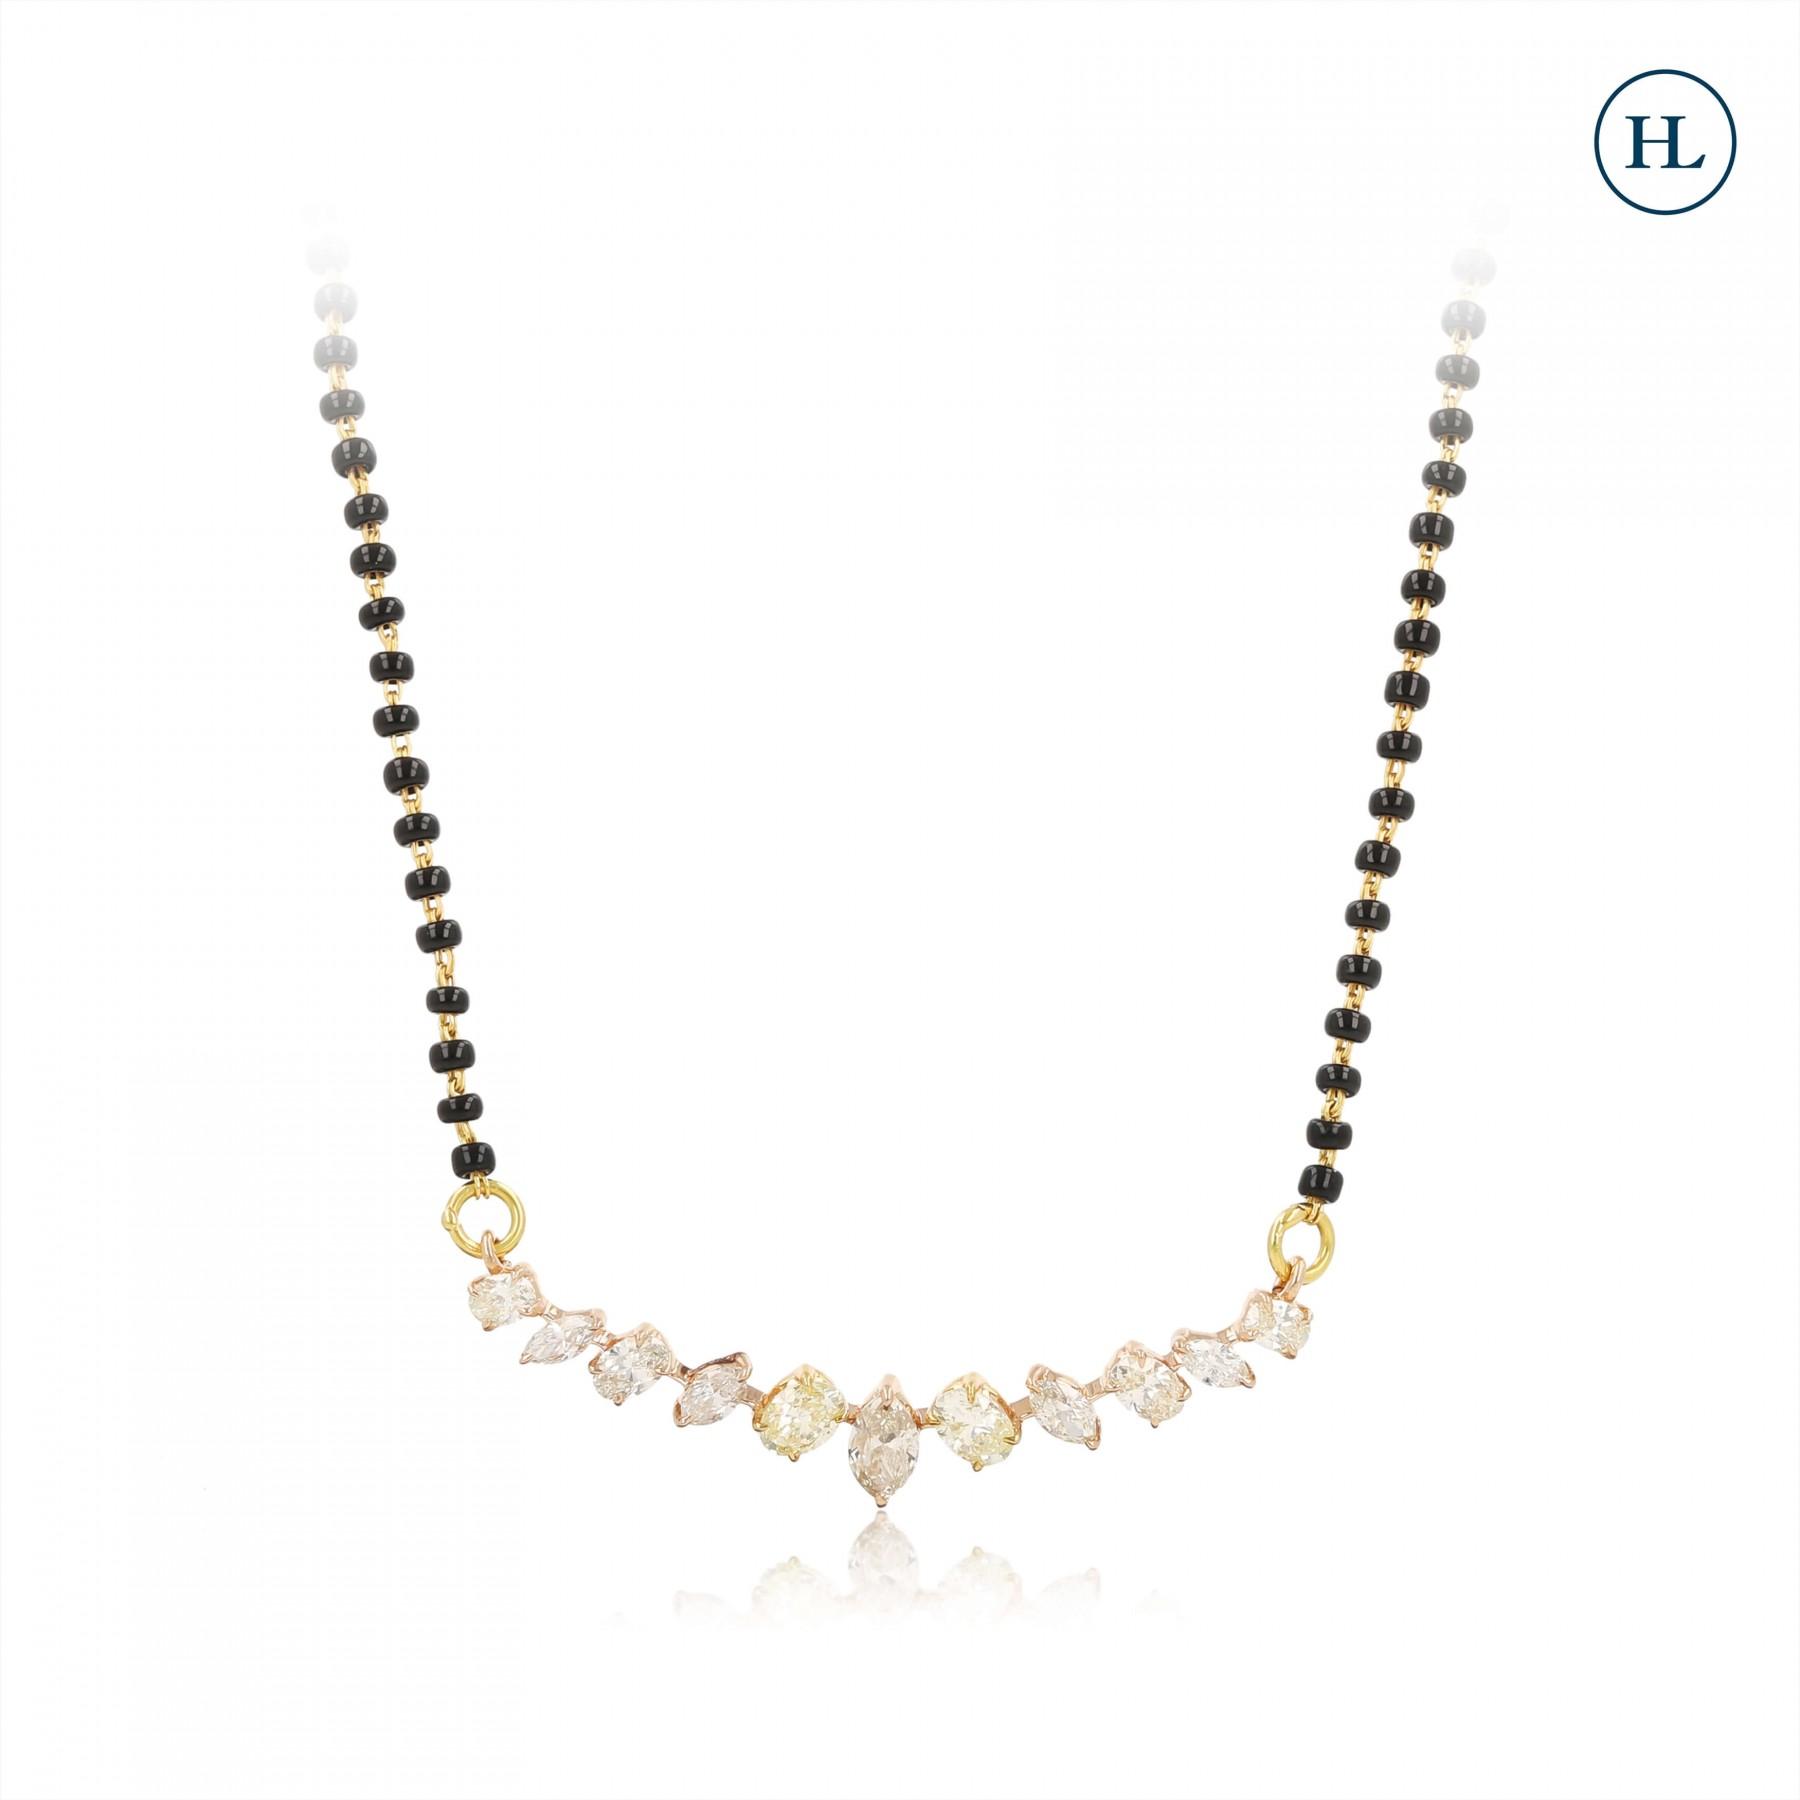 Diamond Mangalsutra with Black Beads Chain